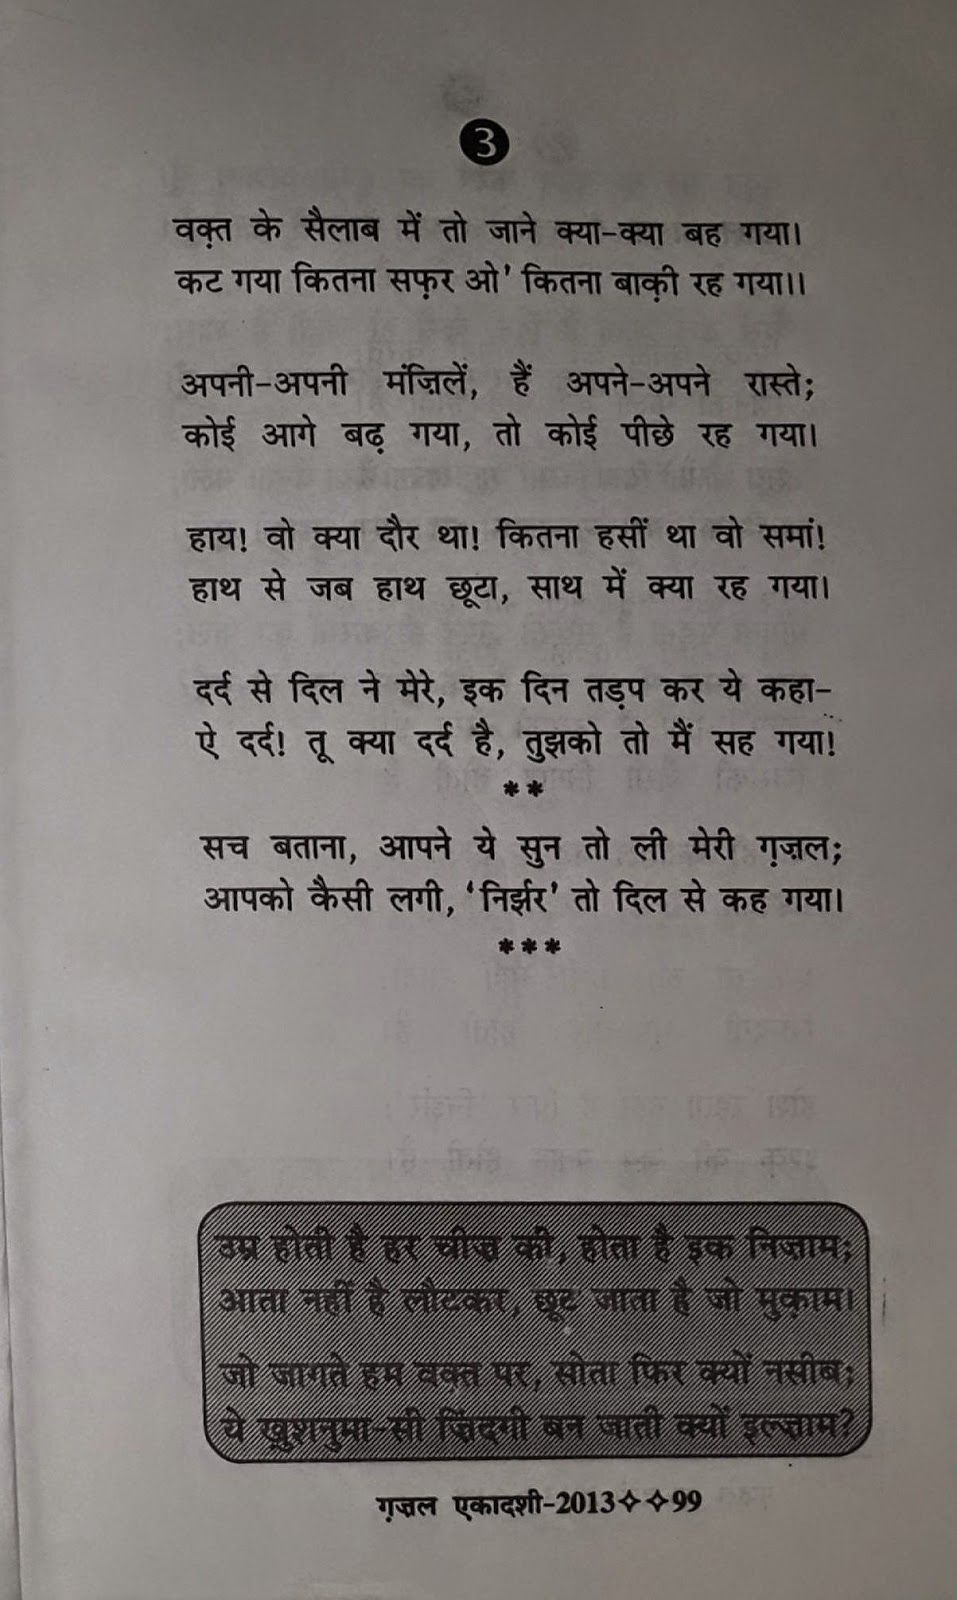 Manoj 'Nirjhar's Ghazals